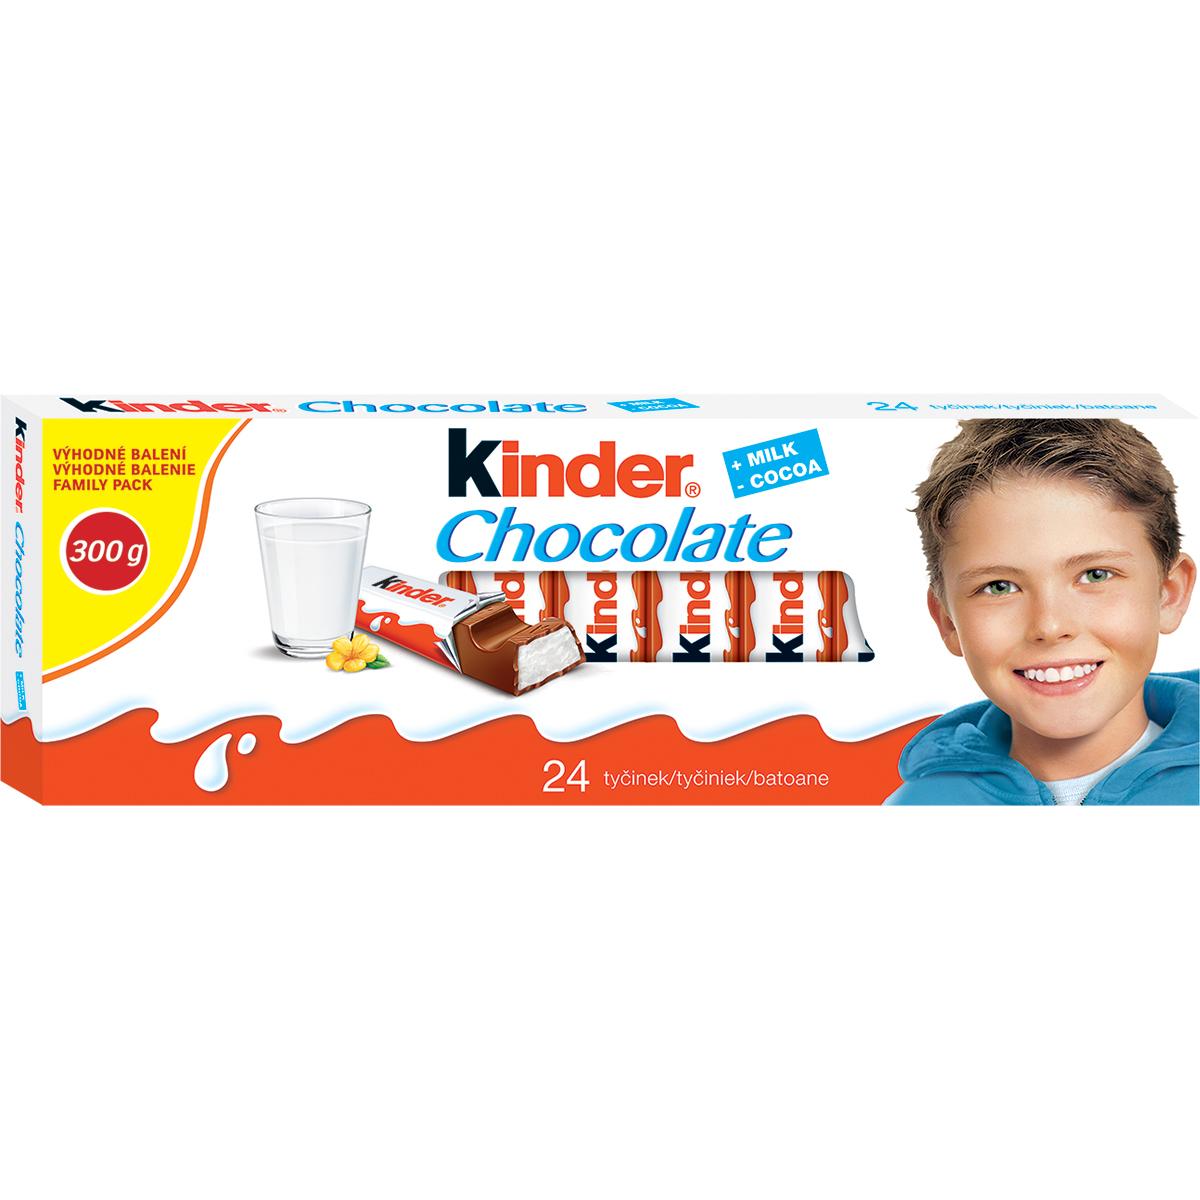 Batoane de ciocolata Kinder Chocolate, 24 buc imagine